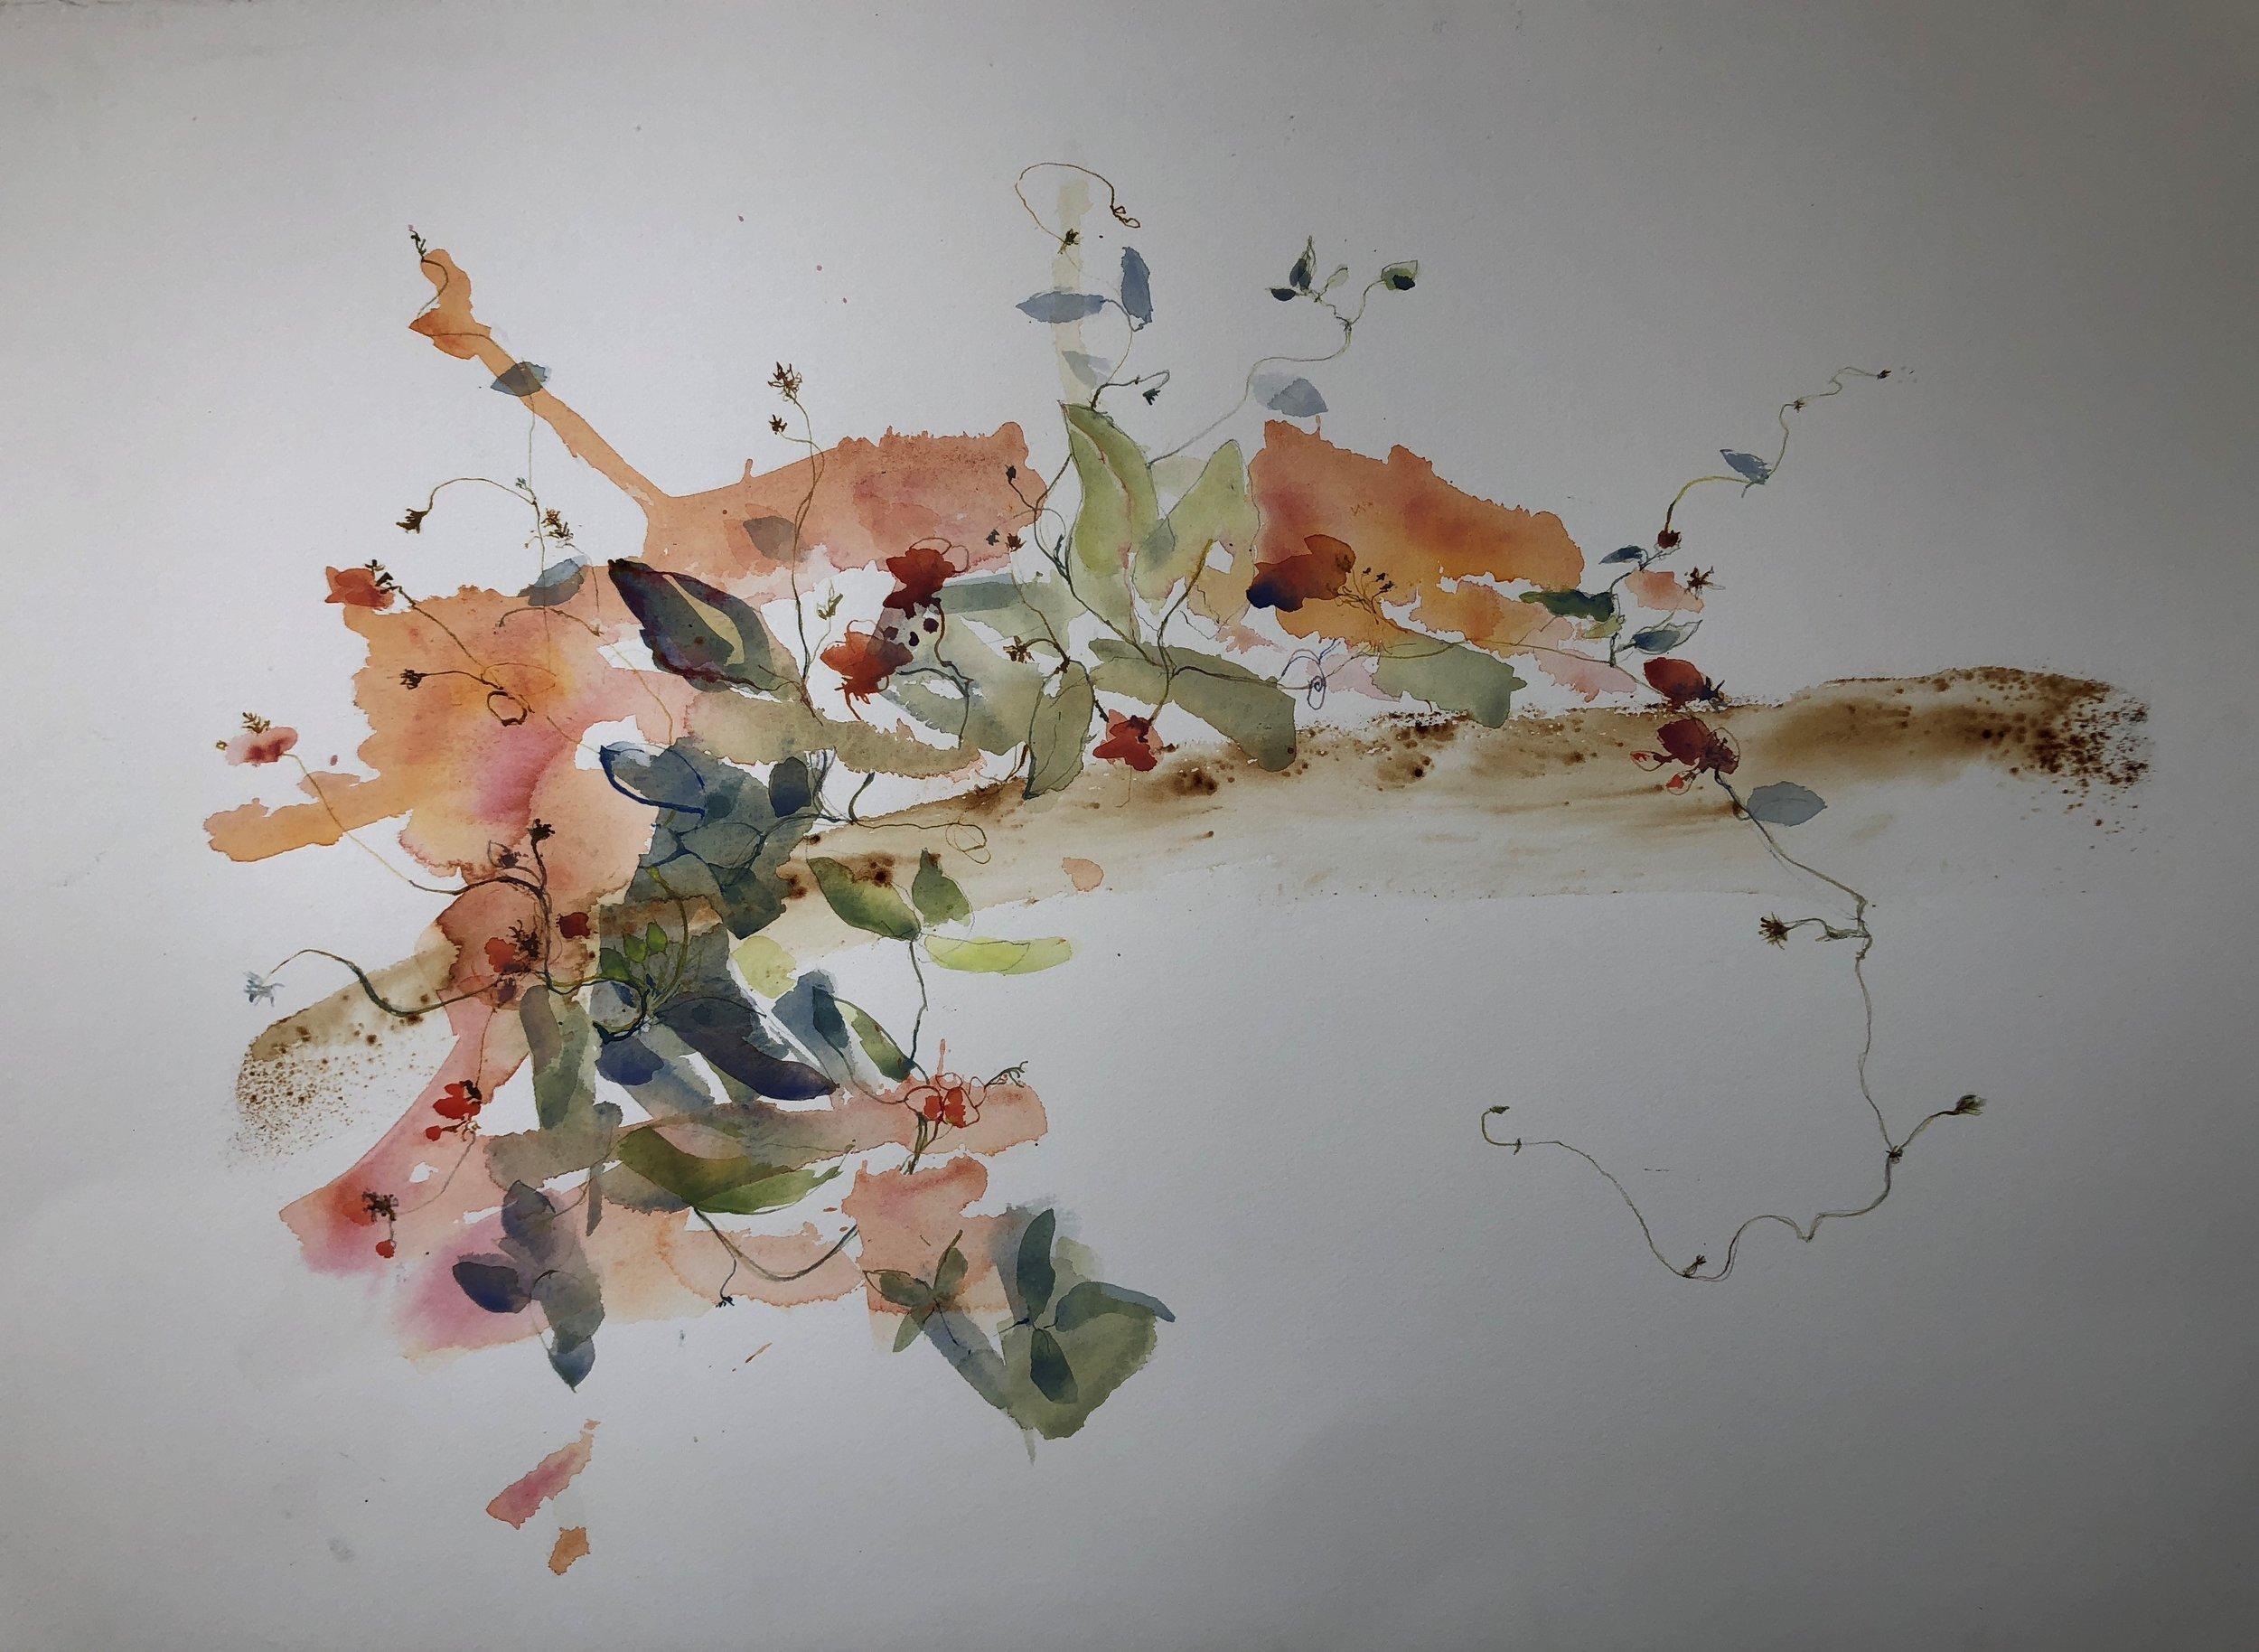 Mandy Ferreira_Kennedia Coccinea1_2018_watercolours pencil on paper_770x570cm..jpg